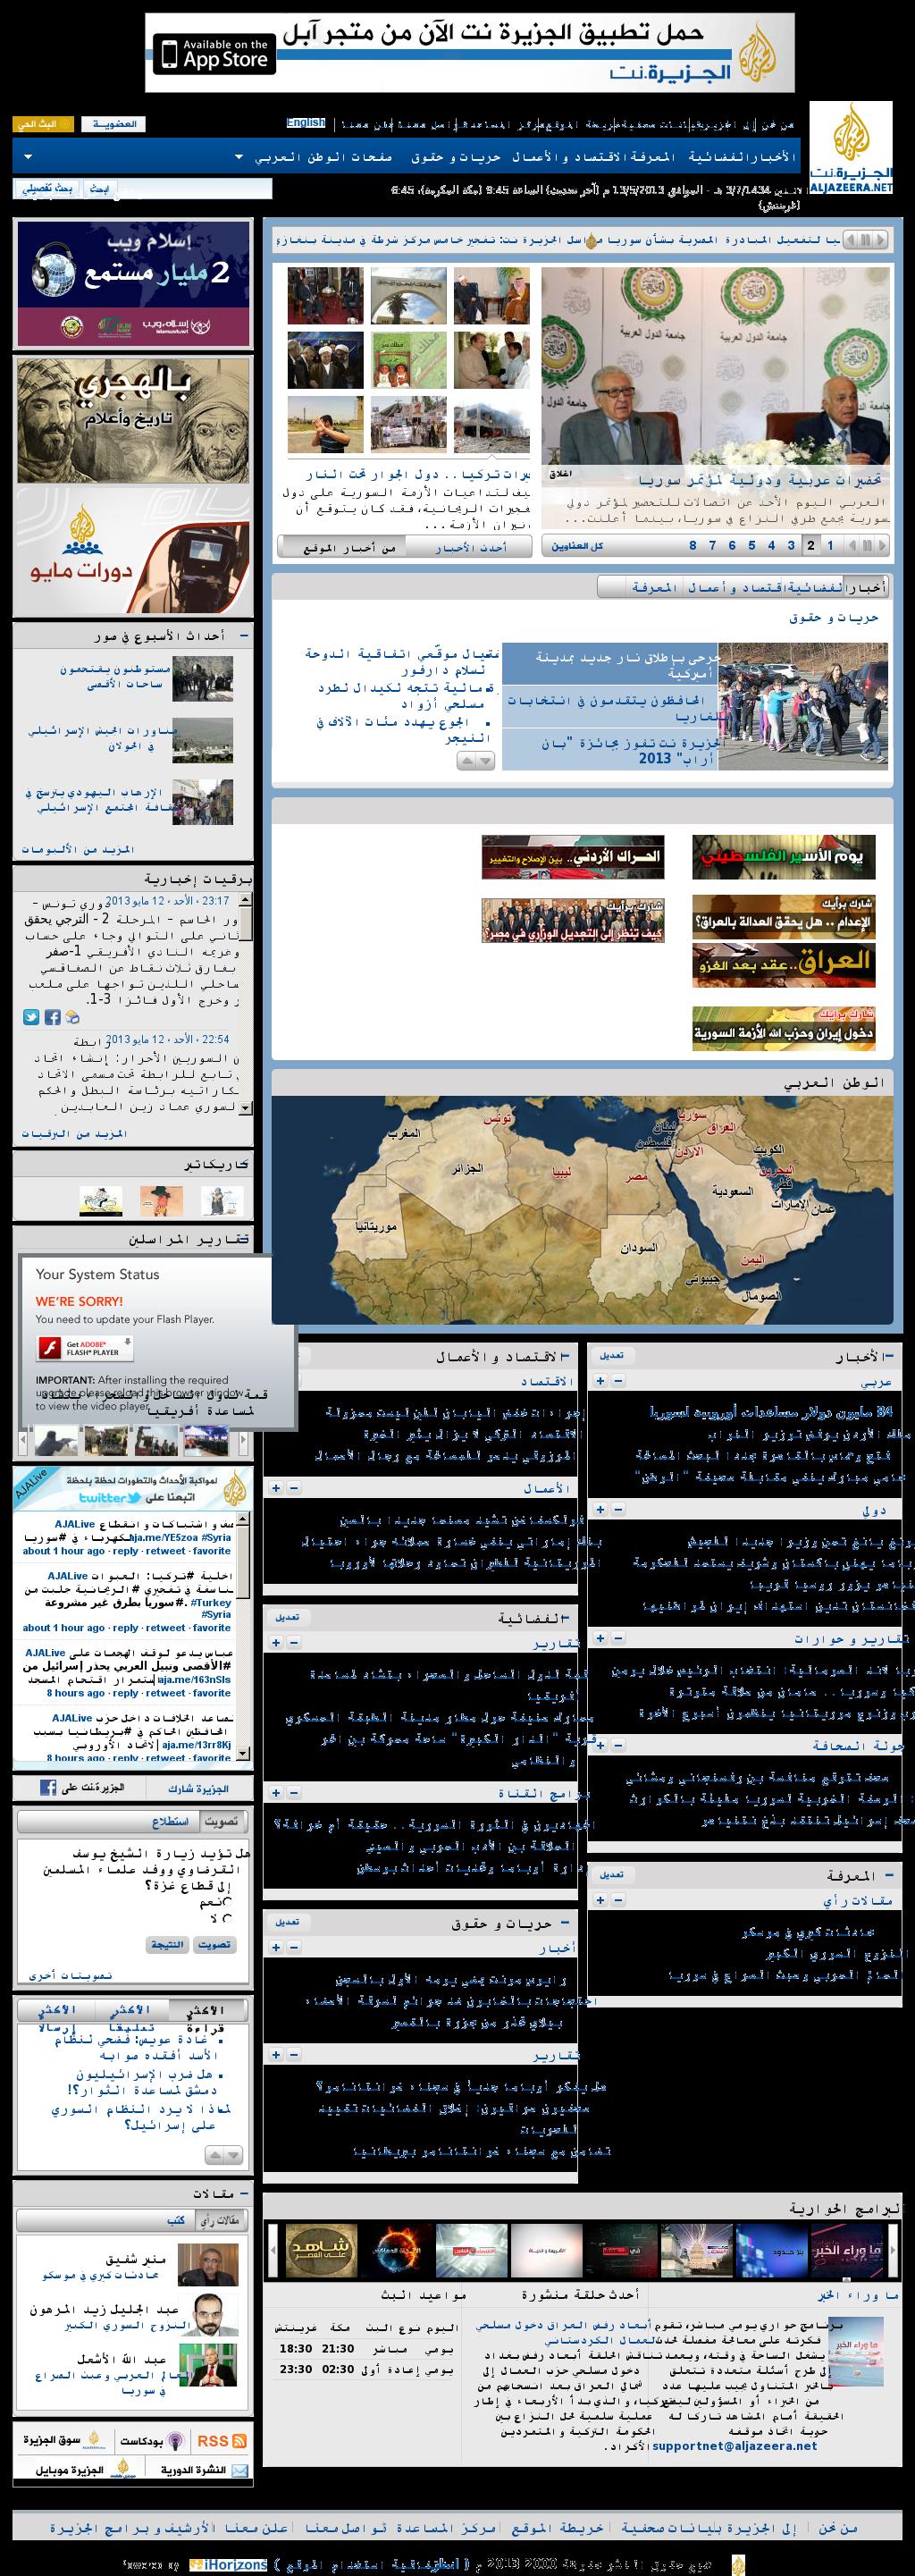 Al Jazeera at Monday May 13, 2013, 7:10 a.m. UTC